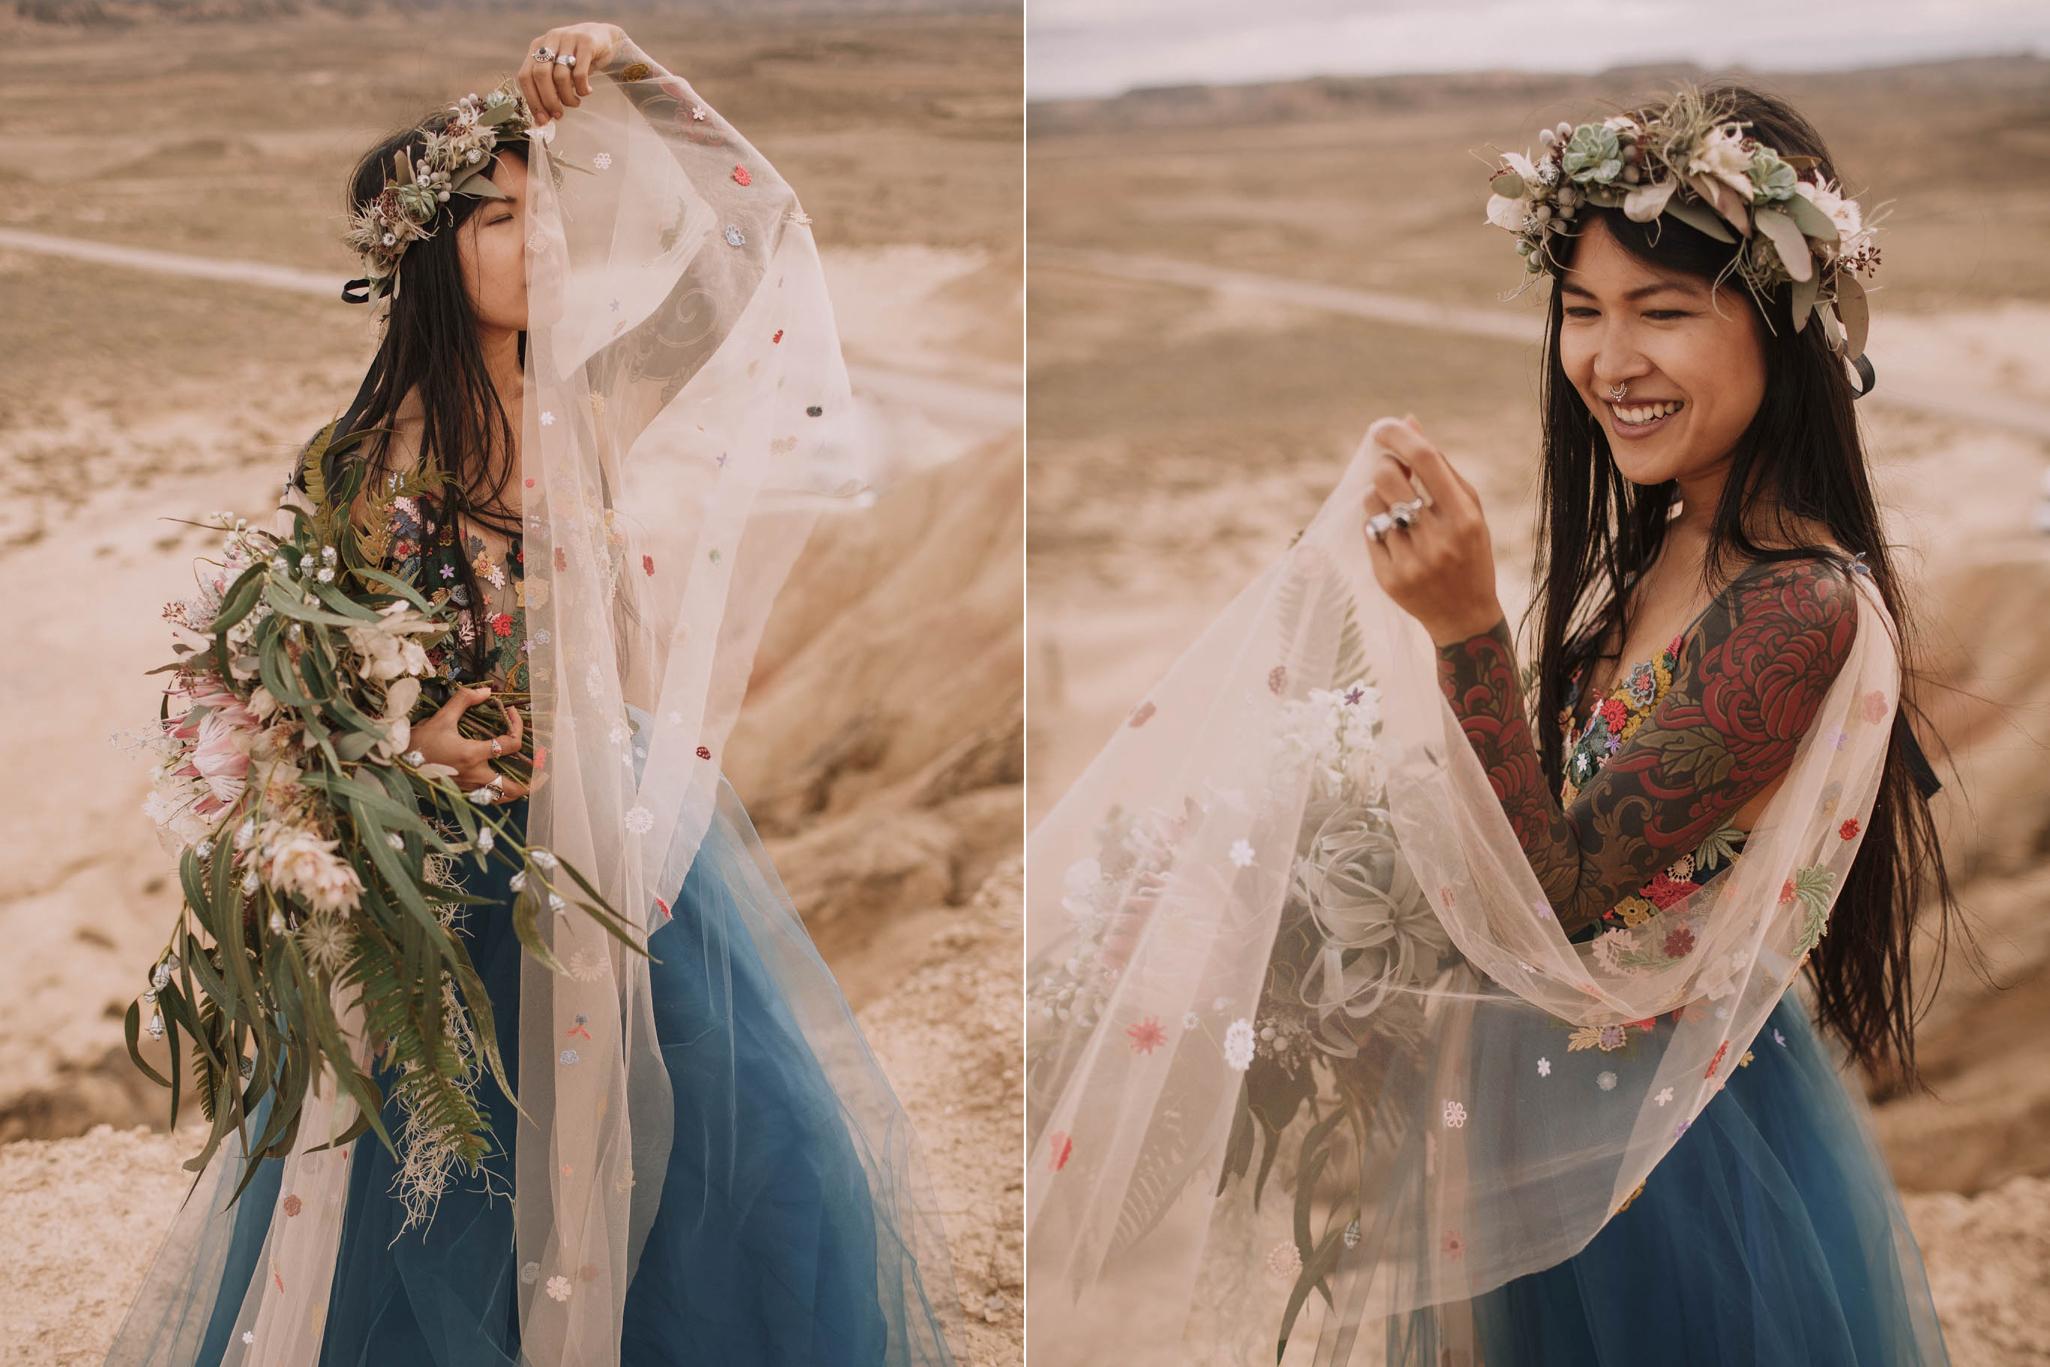 Spain-wedding-photographer-bardenas-reales-jeremy-boyer-photographe-mariage-bordeaux-floral-wedding-dress-robe-117.jpg